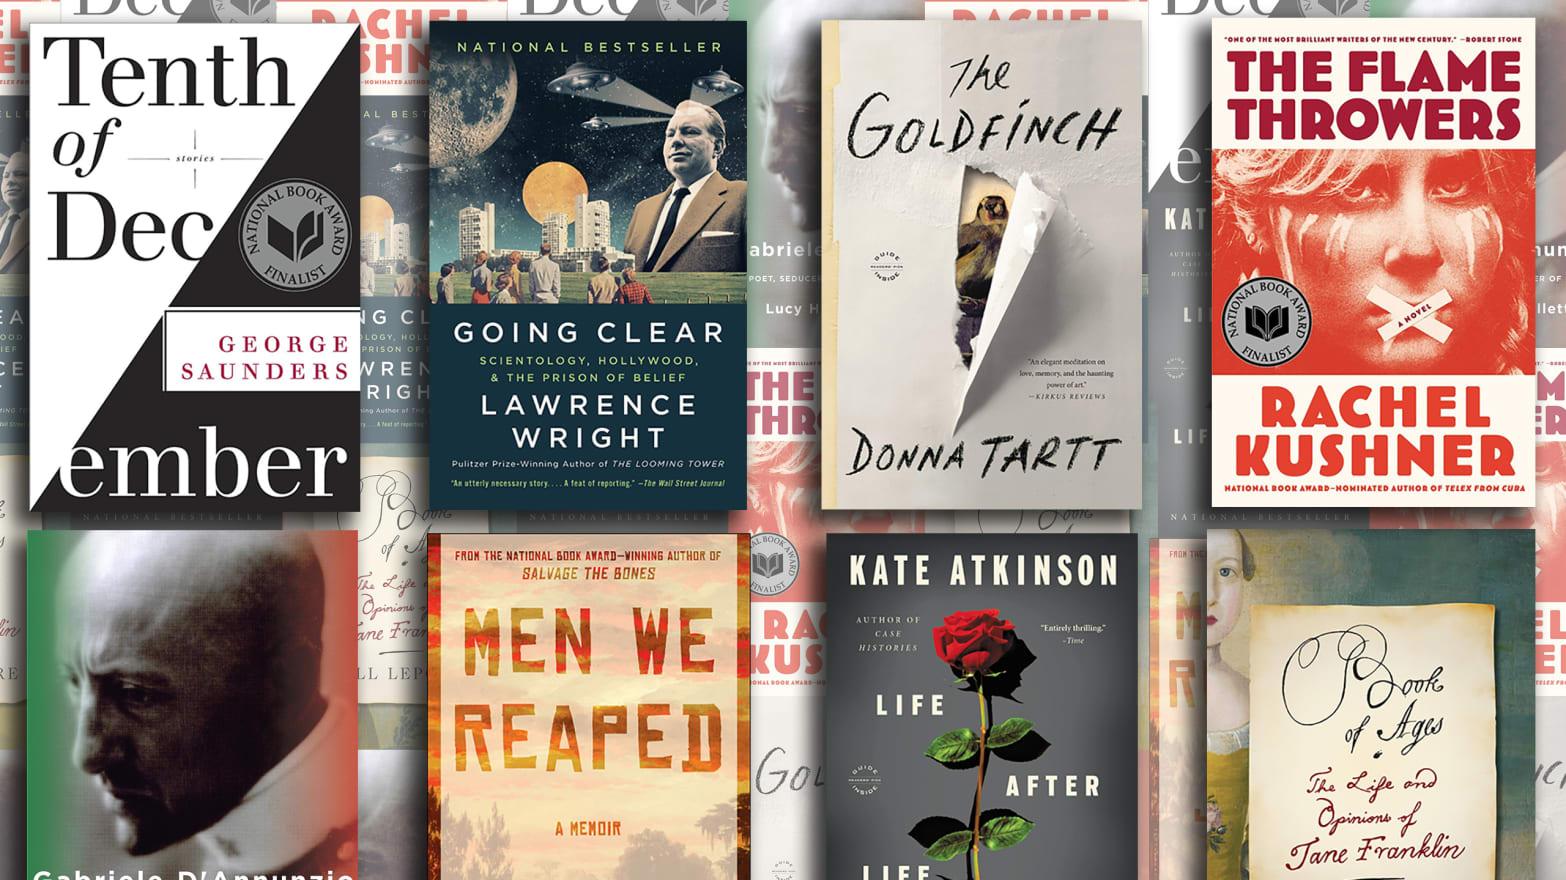 The Best of the Best Books List: 2013 Critics' Top Picks